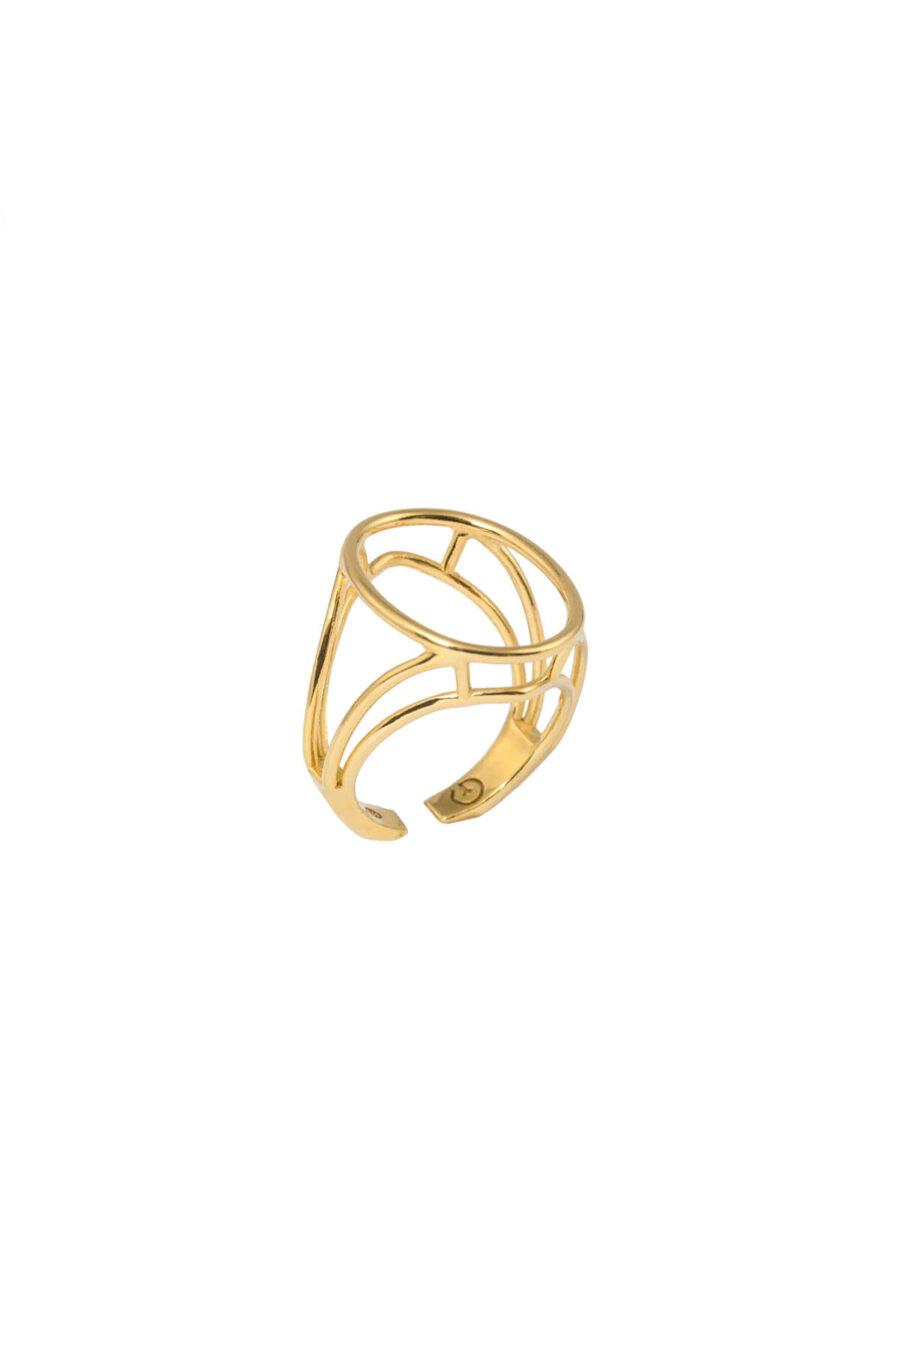 The-empty-signet-ring-by-glenda-lopez-perspectiva